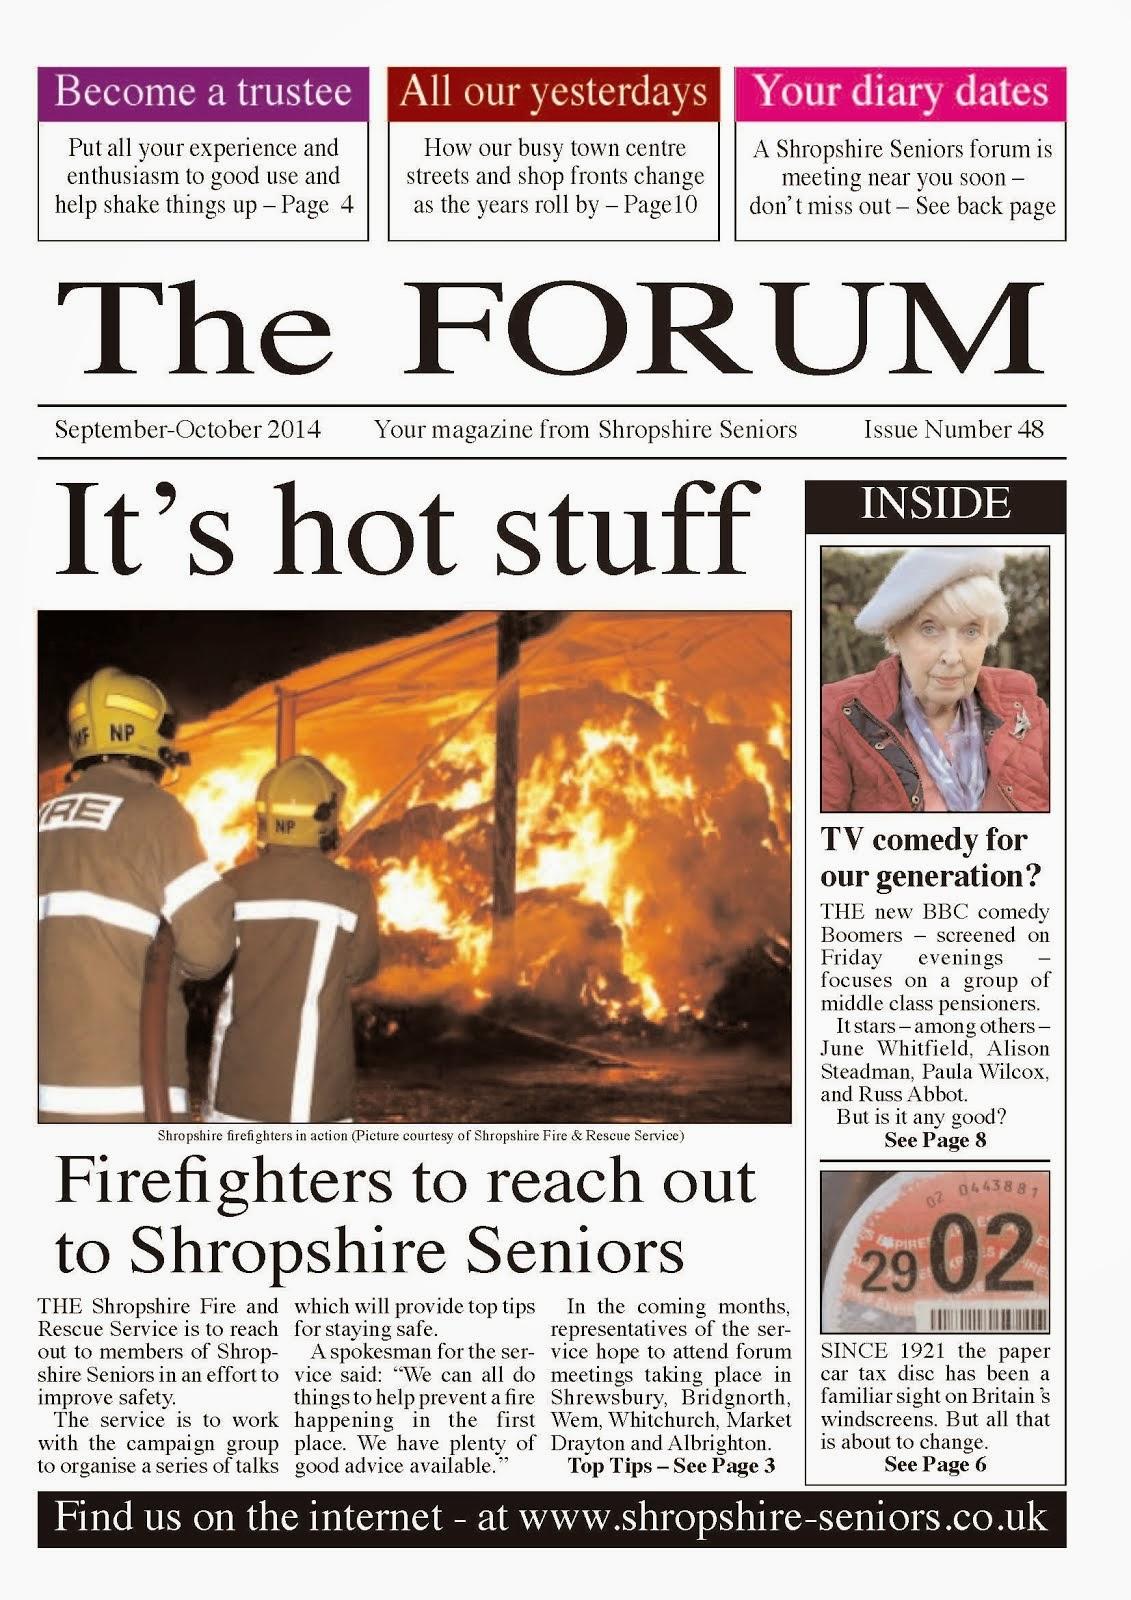 Shropshire Seniors Forum